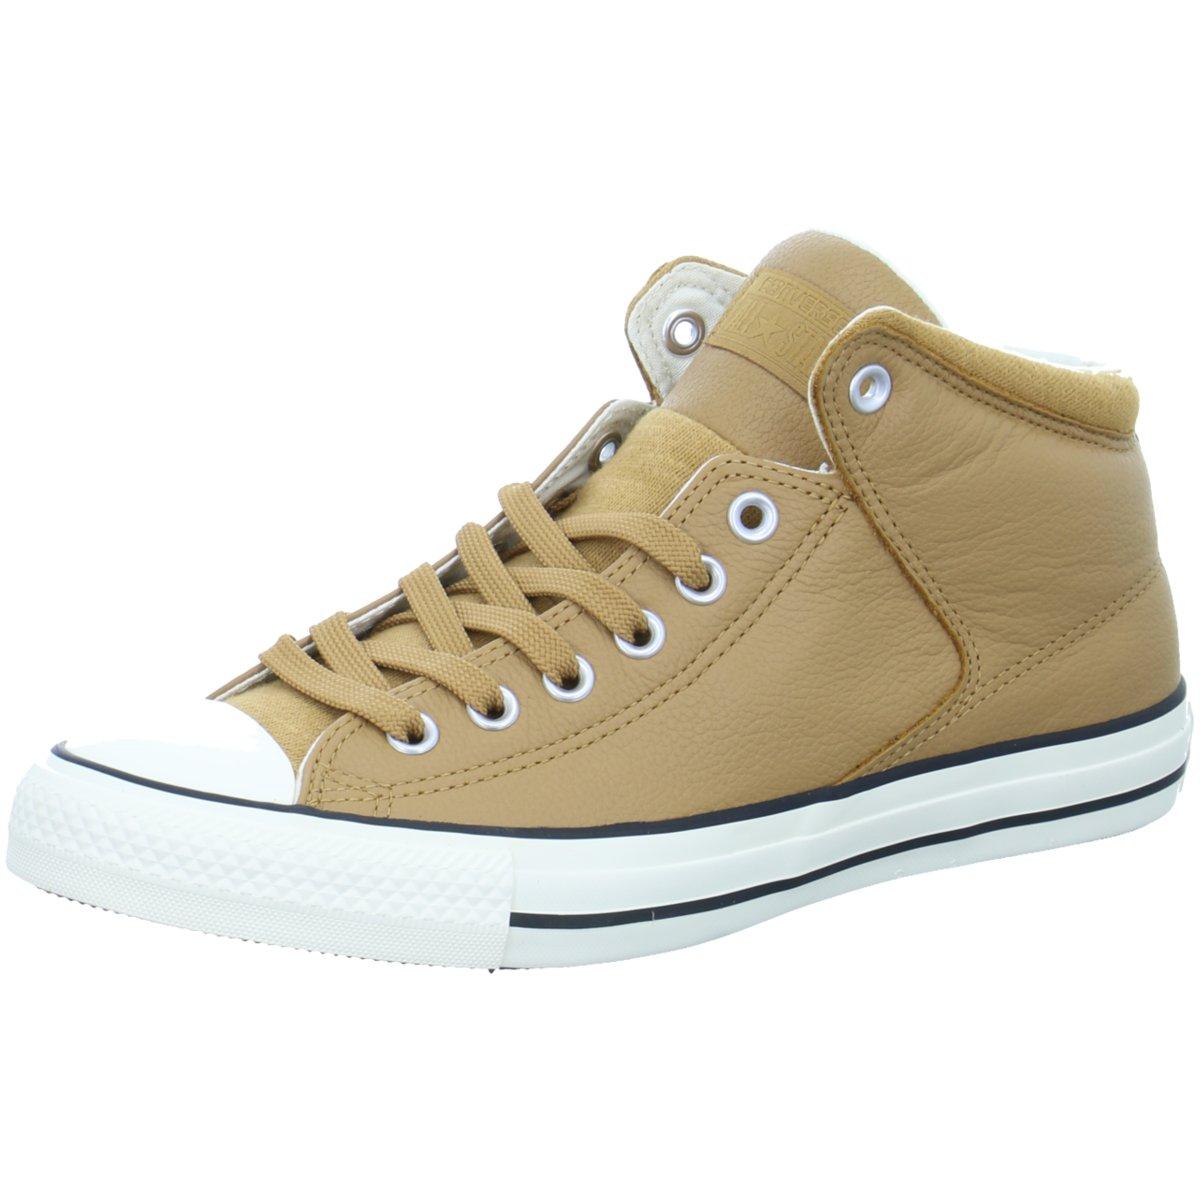 NEU Converse Herren Sneaker 157471C braun 347773